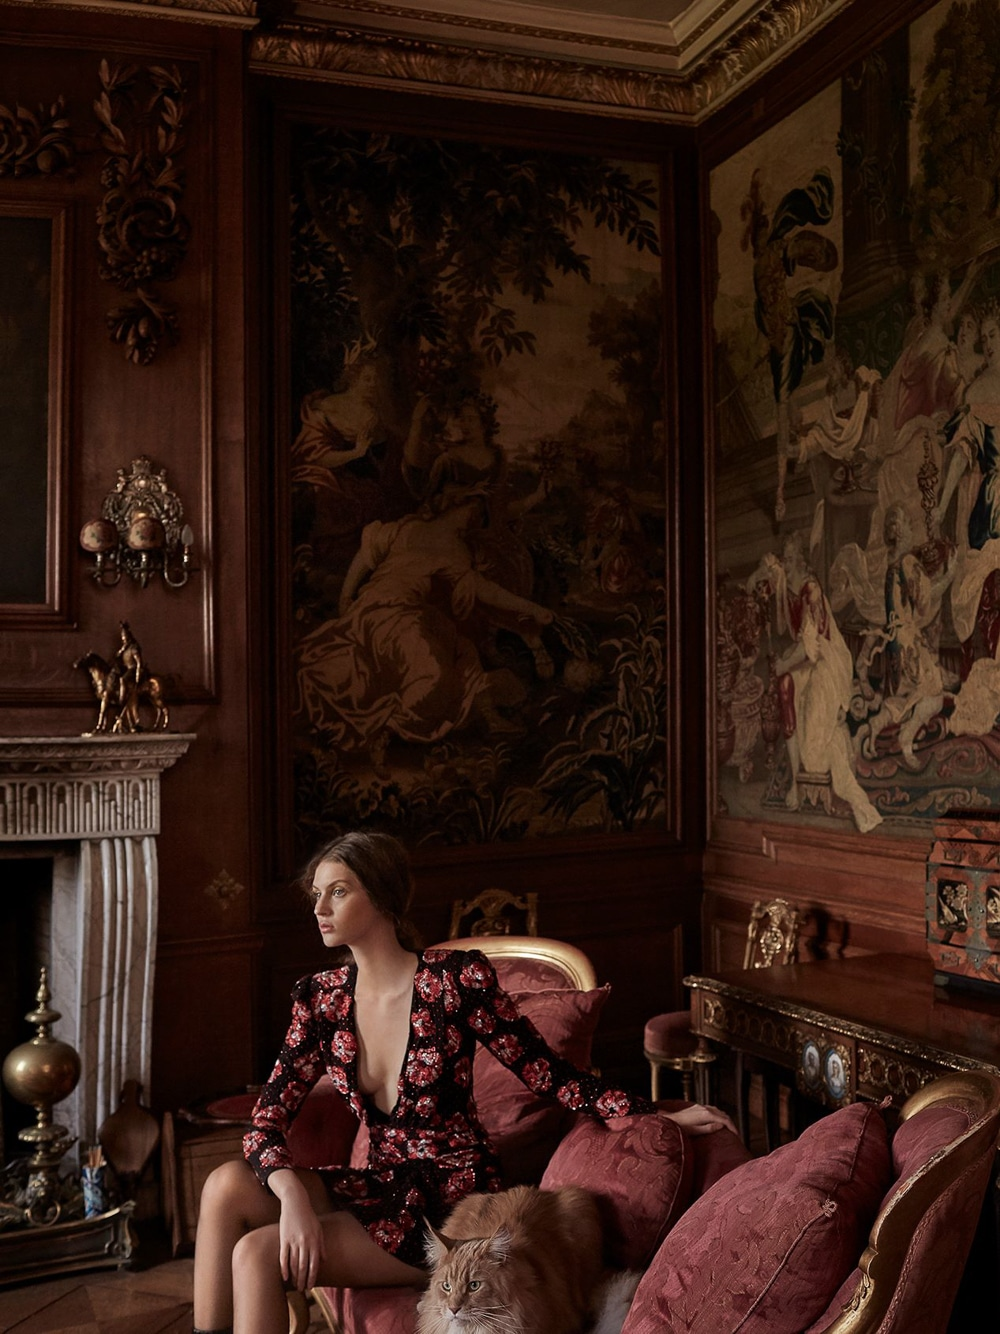 Harpers-Bazaar-UK-Septamber-2018-Florence-Kosky-Agata-Pospieszynska-5.jpg